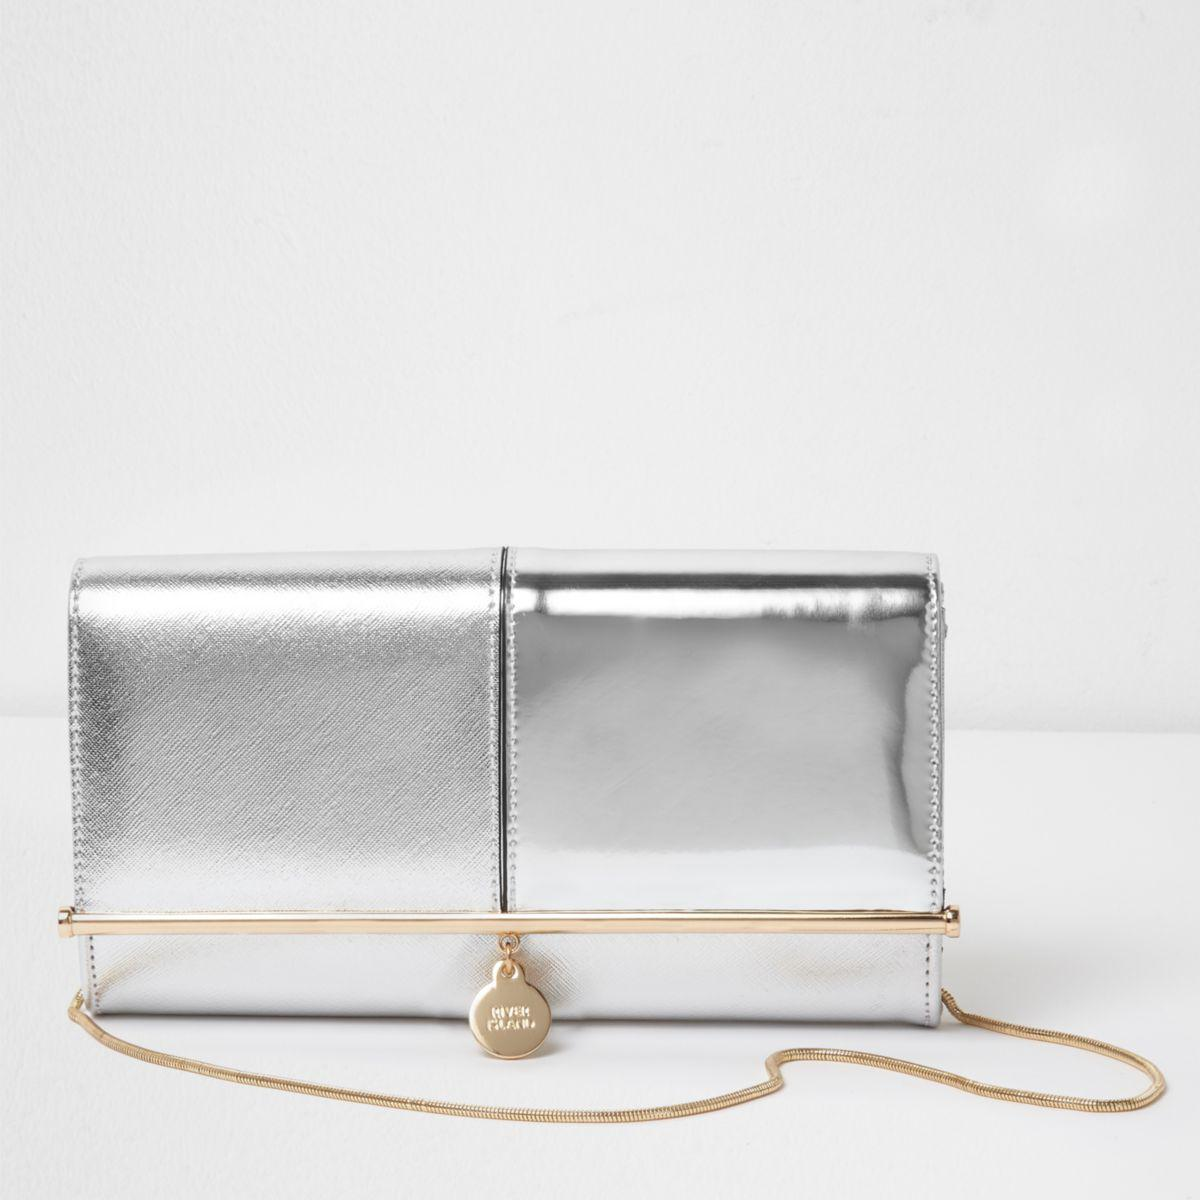 01a4c9741 River Island Silver Metallic Bar Top Charm Clutch Bag Silver ...